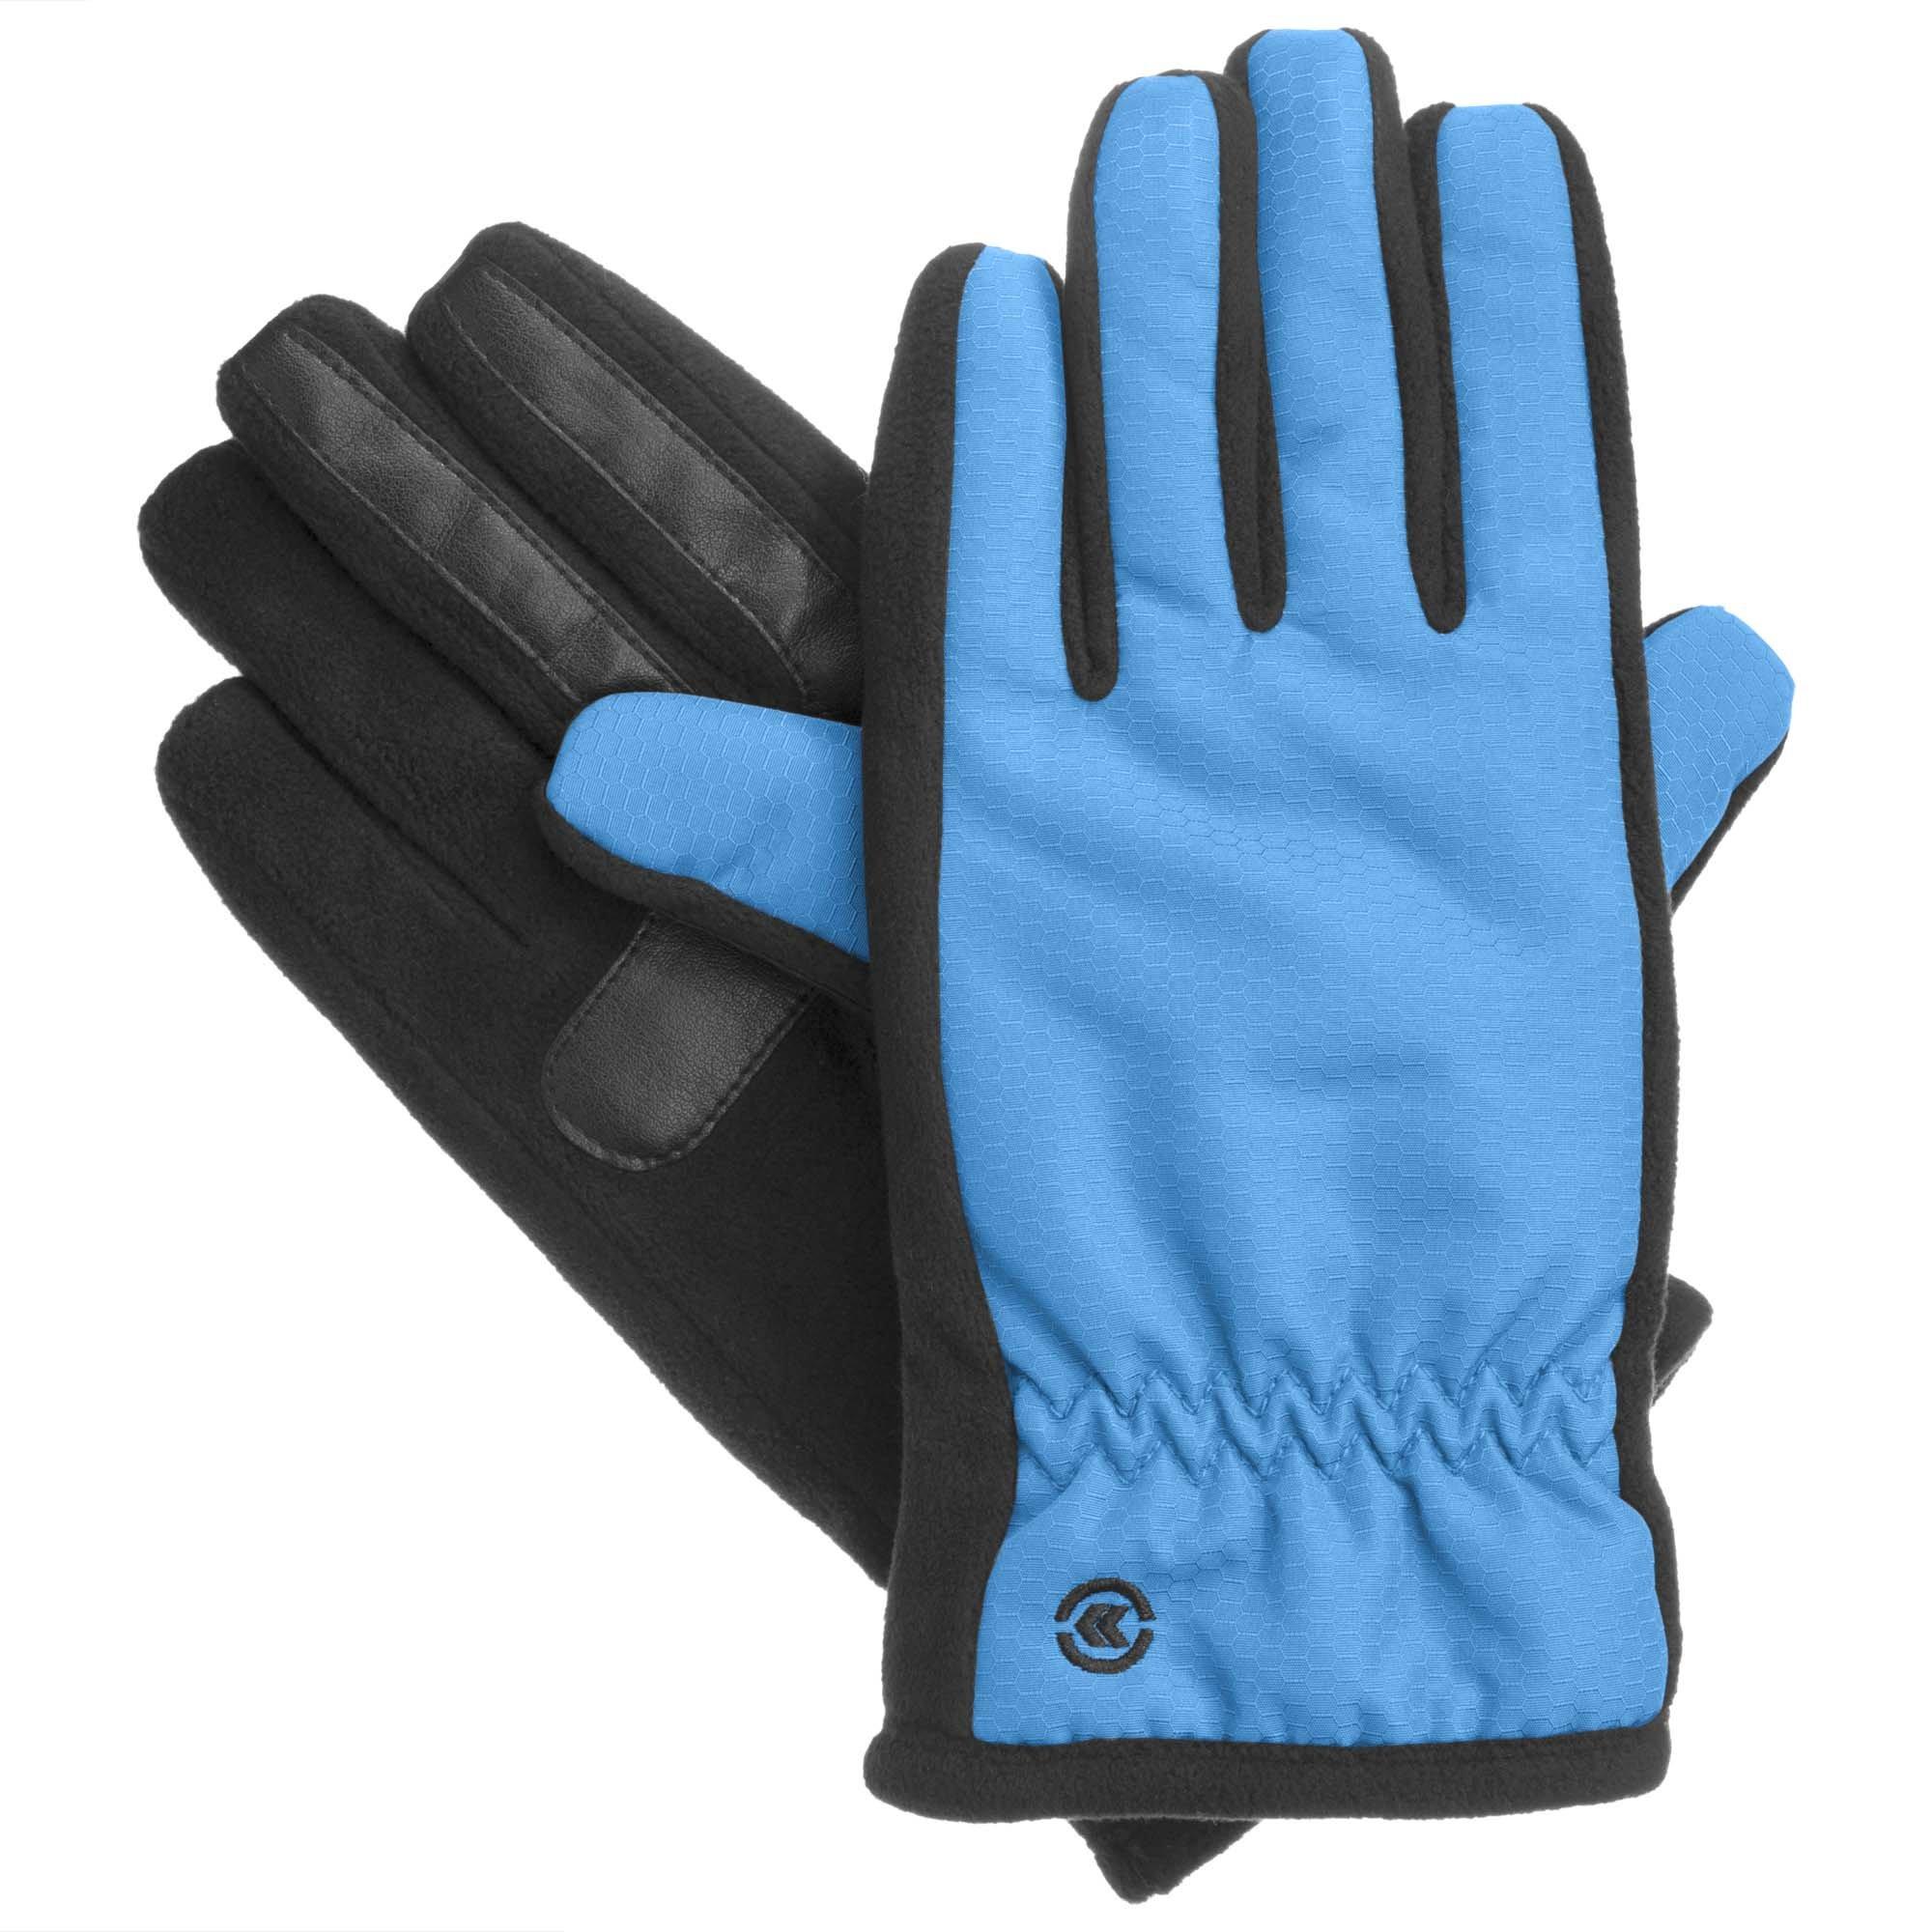 Isotoner Women's Smartouch Matrix Touch Screen Glove (Medium / Large, Dynasty Blue)